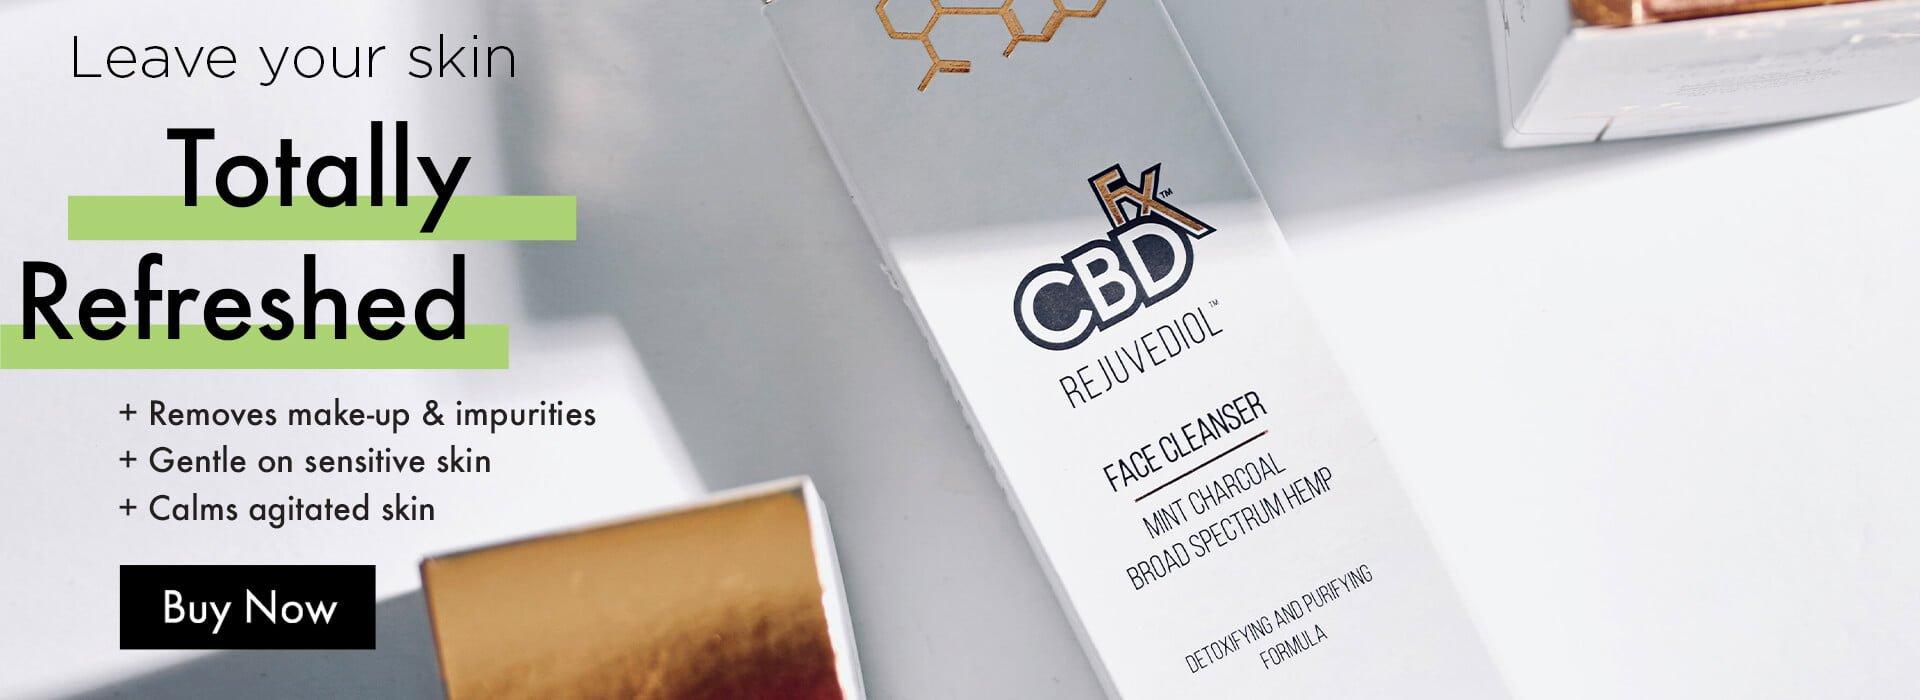 CBDfx CBD hemp face cleanser rejuvediol charcoal mint face beauty skin clean desktop banner